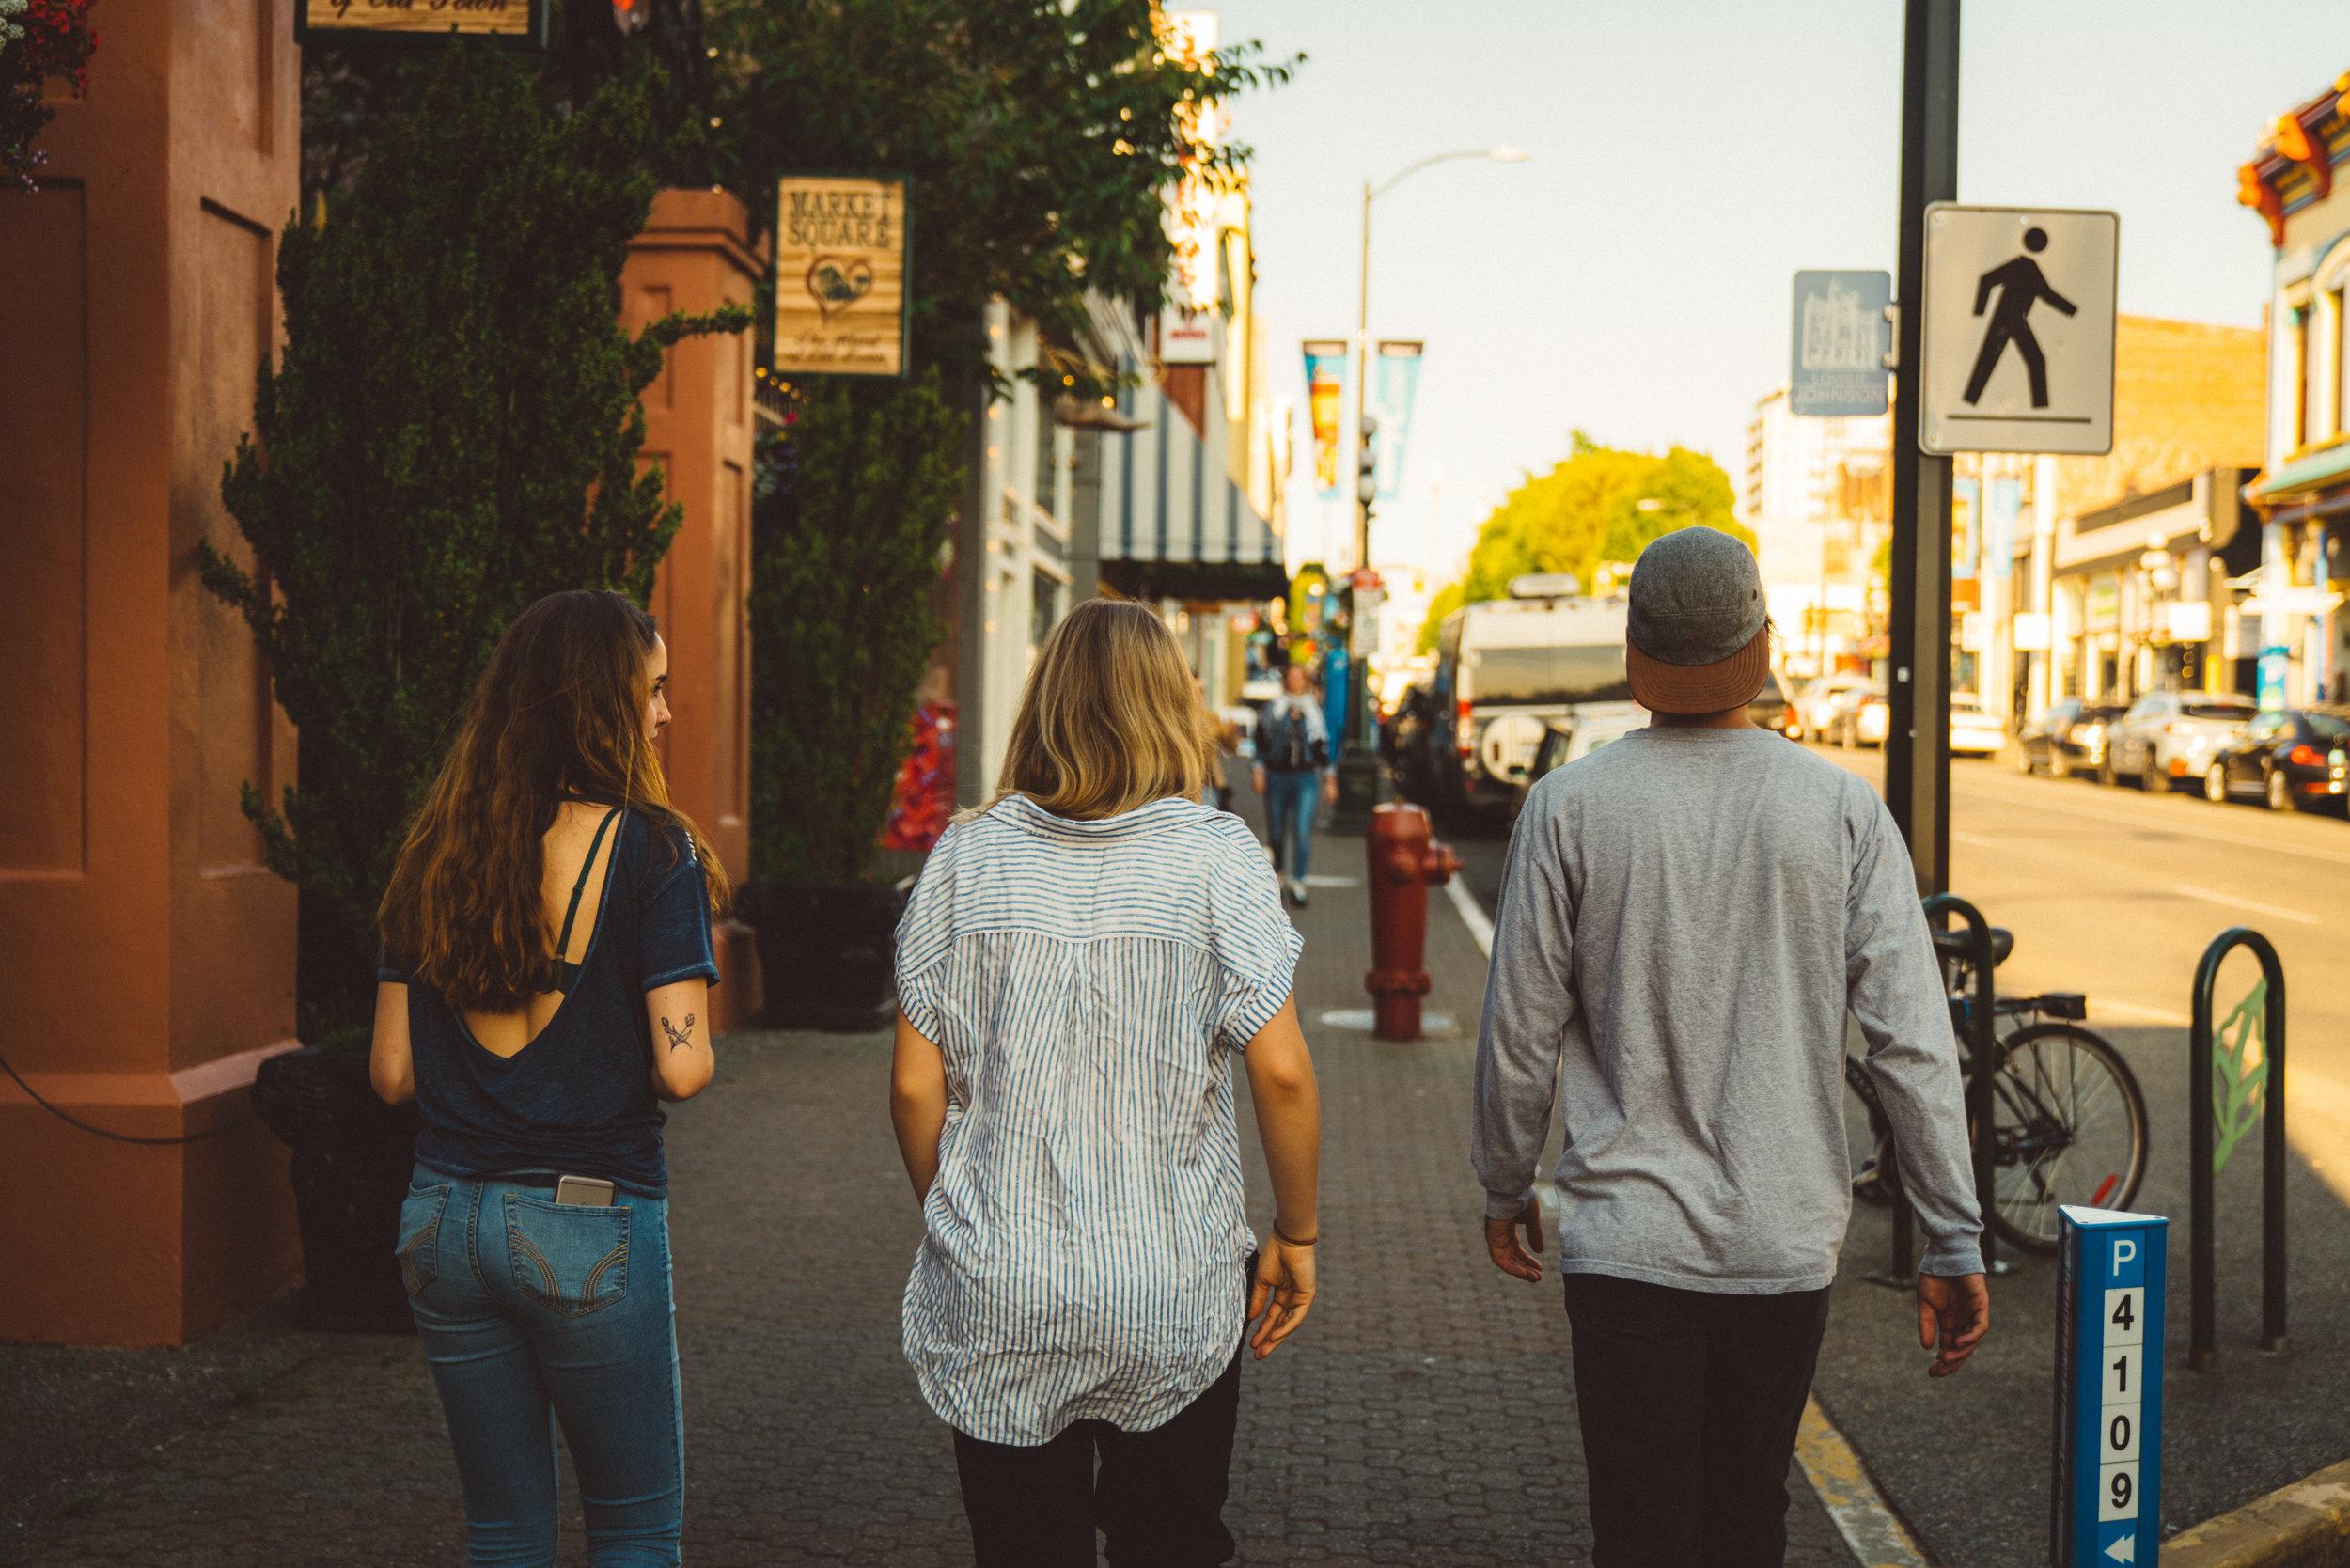 Annika, Danielle, and Niko.